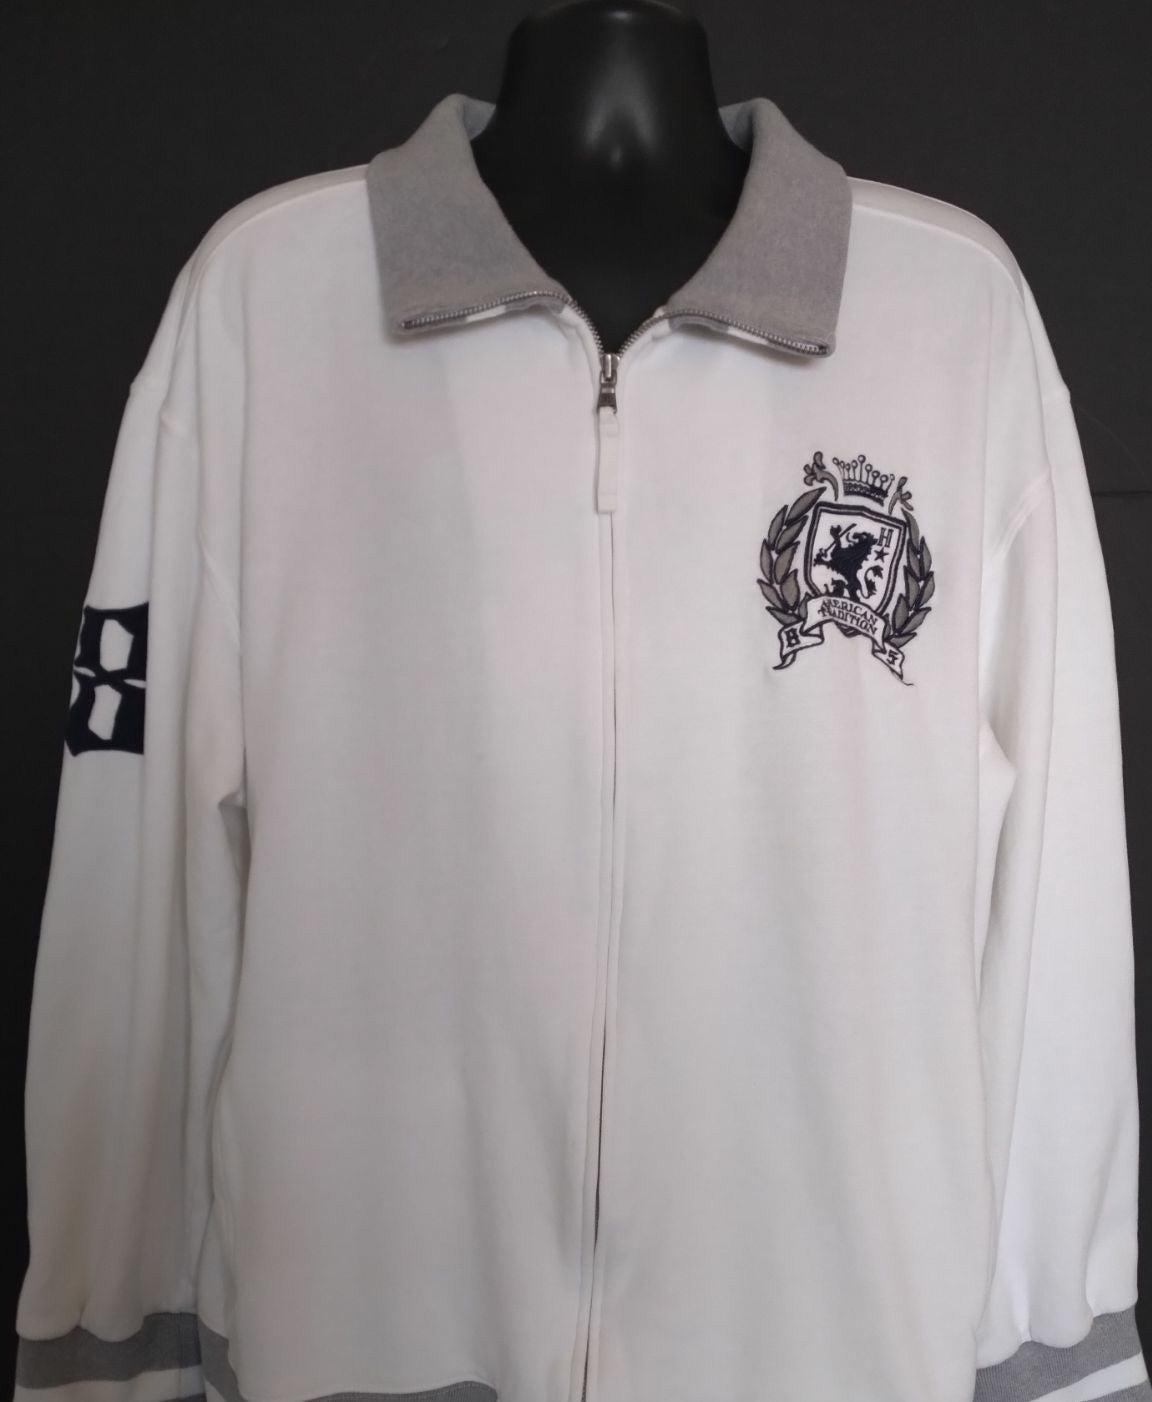 Tommy Hilfiger Men 2XL Sweatshirt Jacket